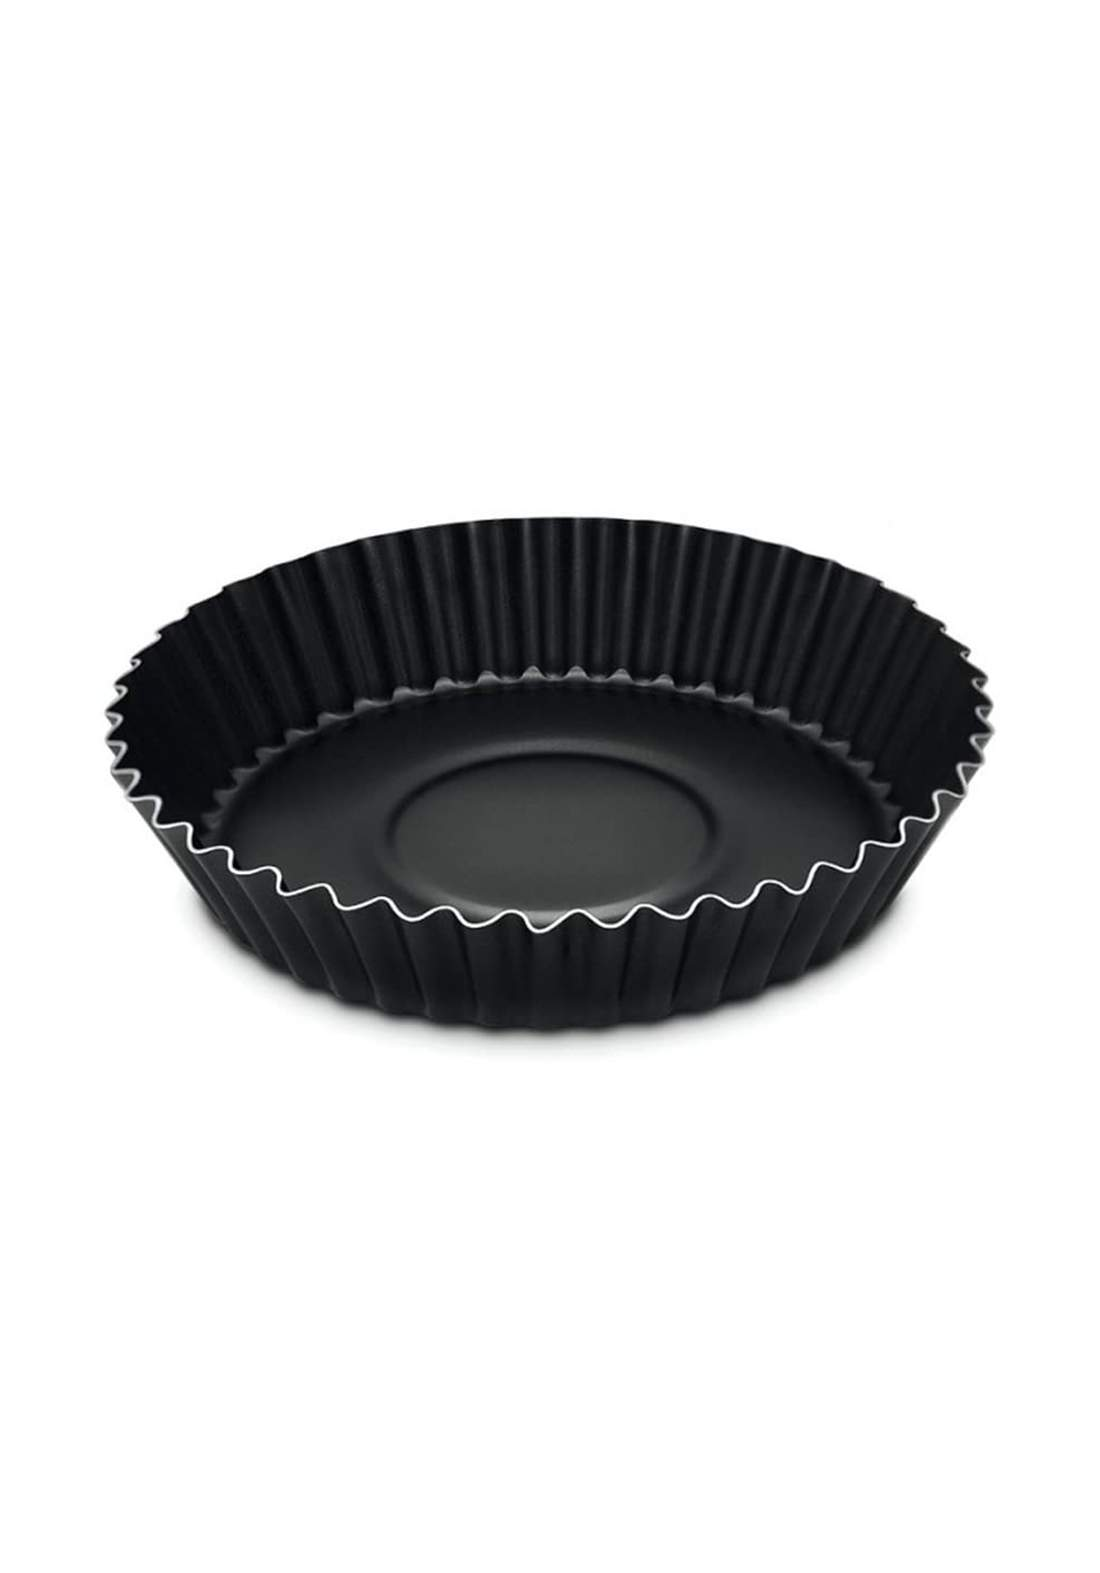 Tramontina '20056-024 Cake Mold  26 cm Black  قالب كيك مقرنص